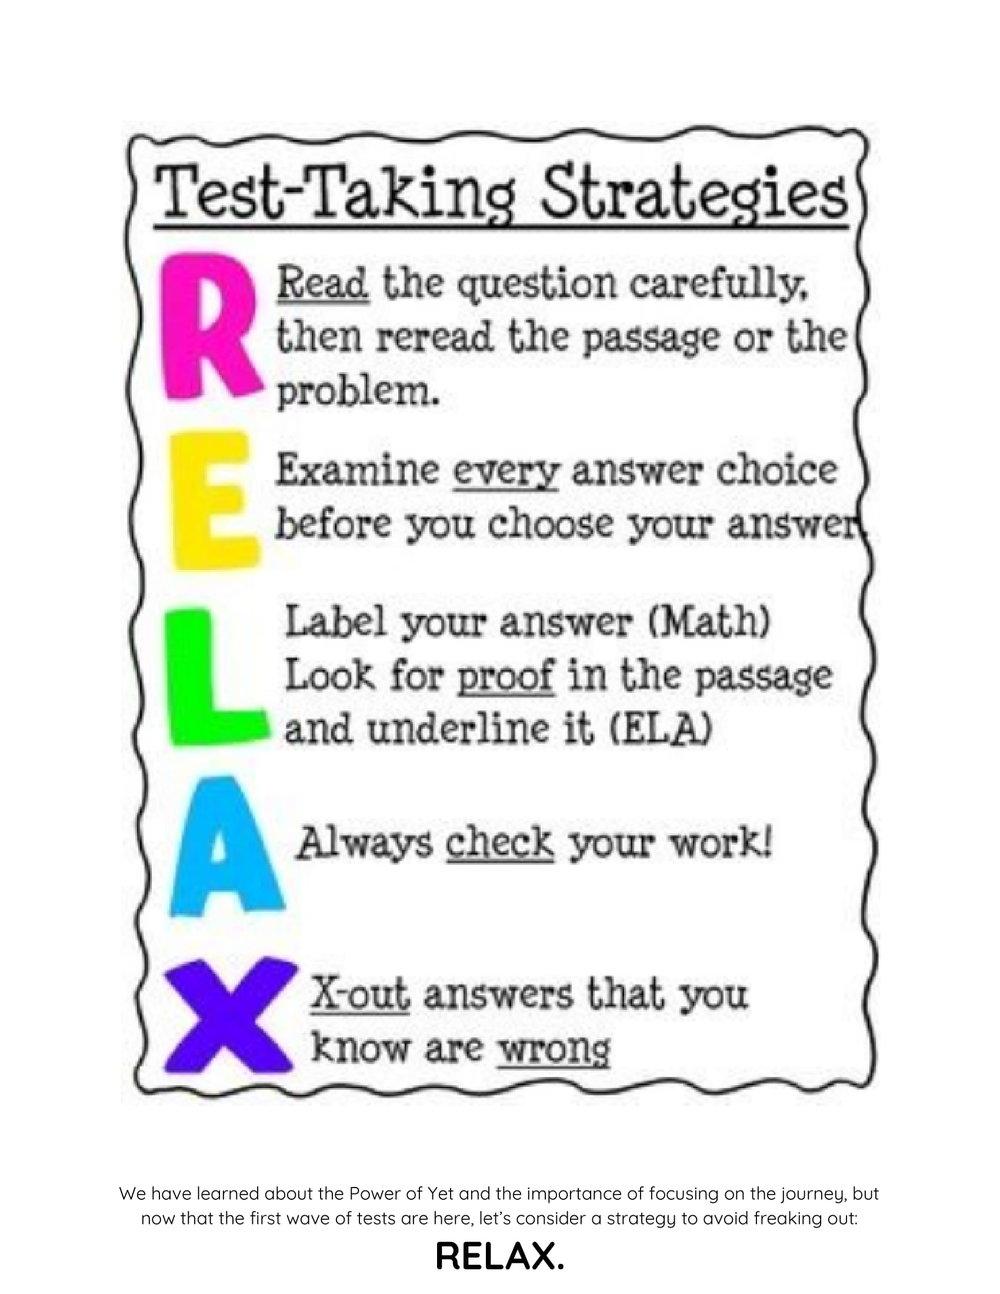 RELAX Test Taking Strategies-1.jpg